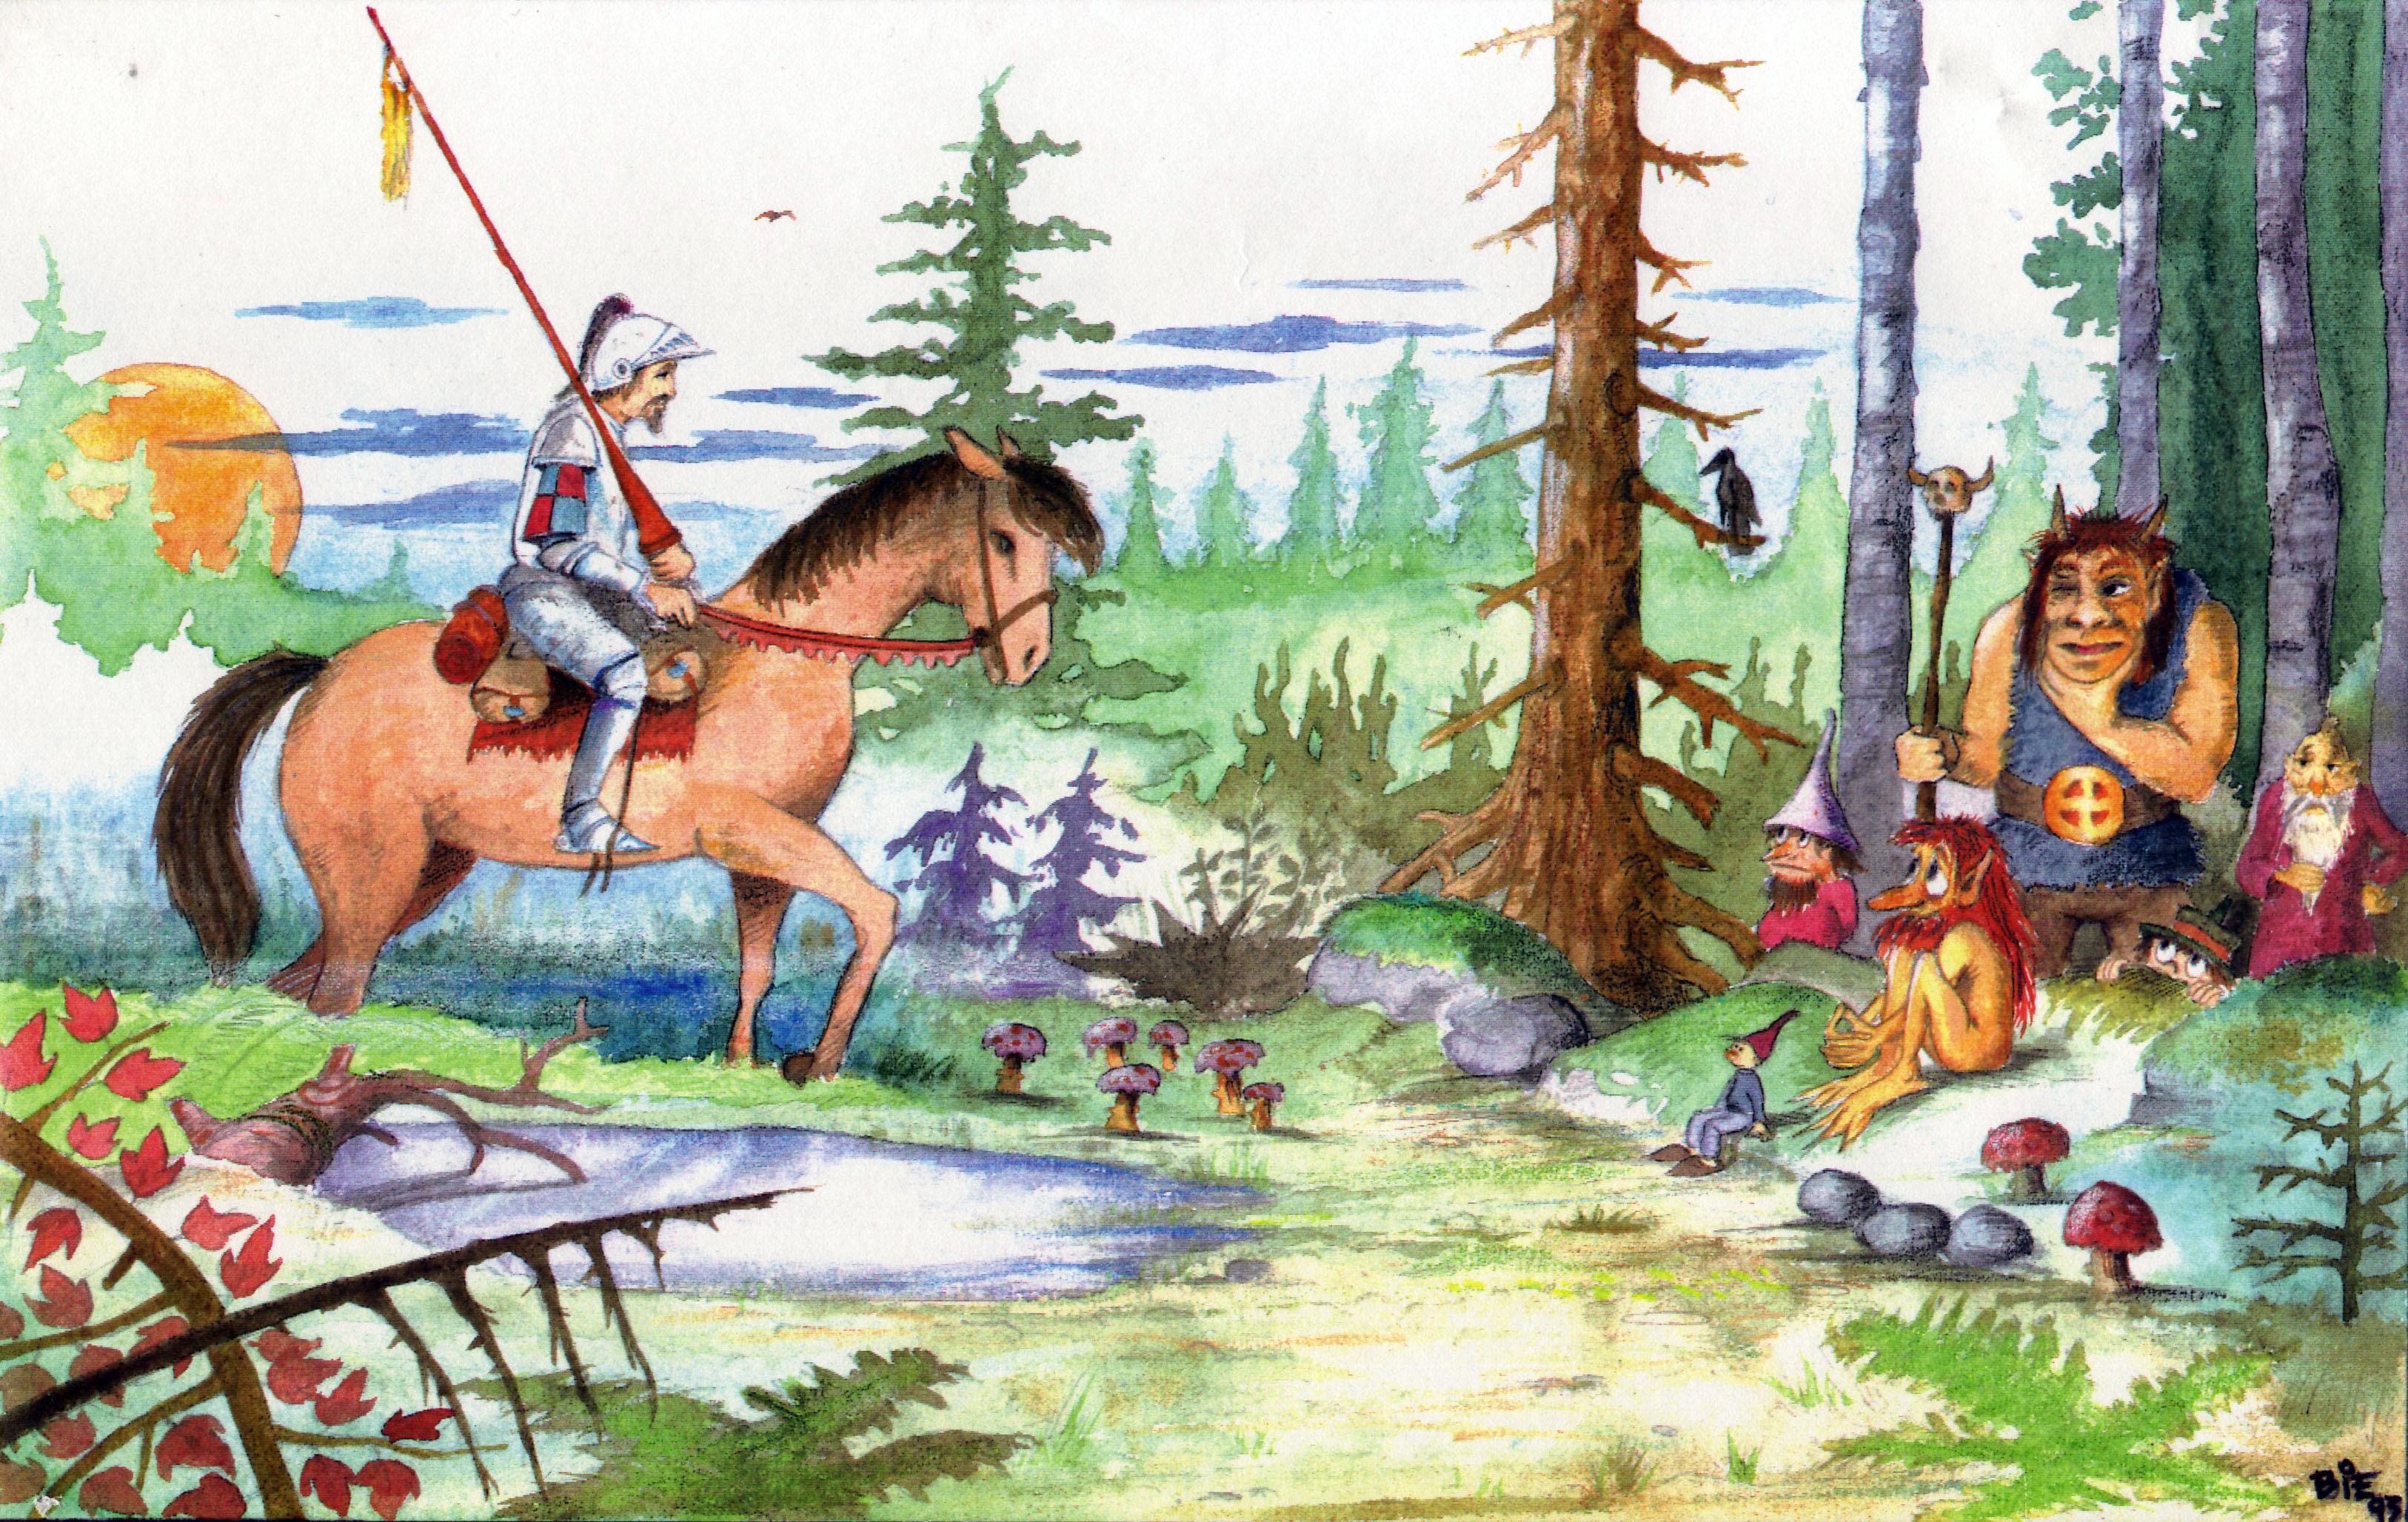 Søren Bie. Akvarel 1993